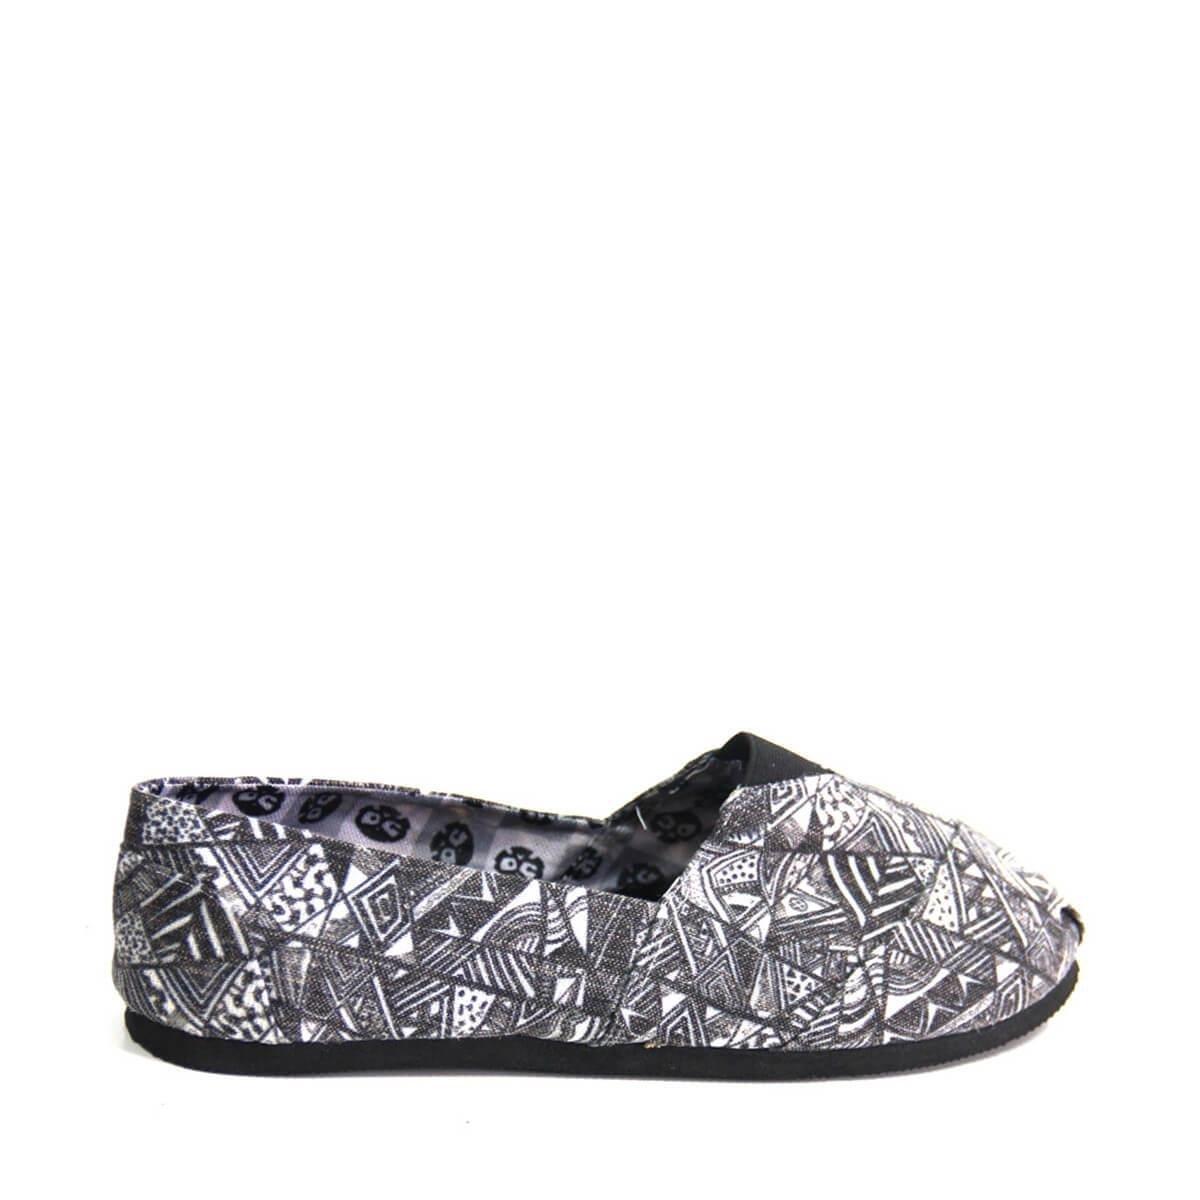 e Shoes Alpargata Preto is Cool Inbox Old Cinza Feminina Black FF8xtw